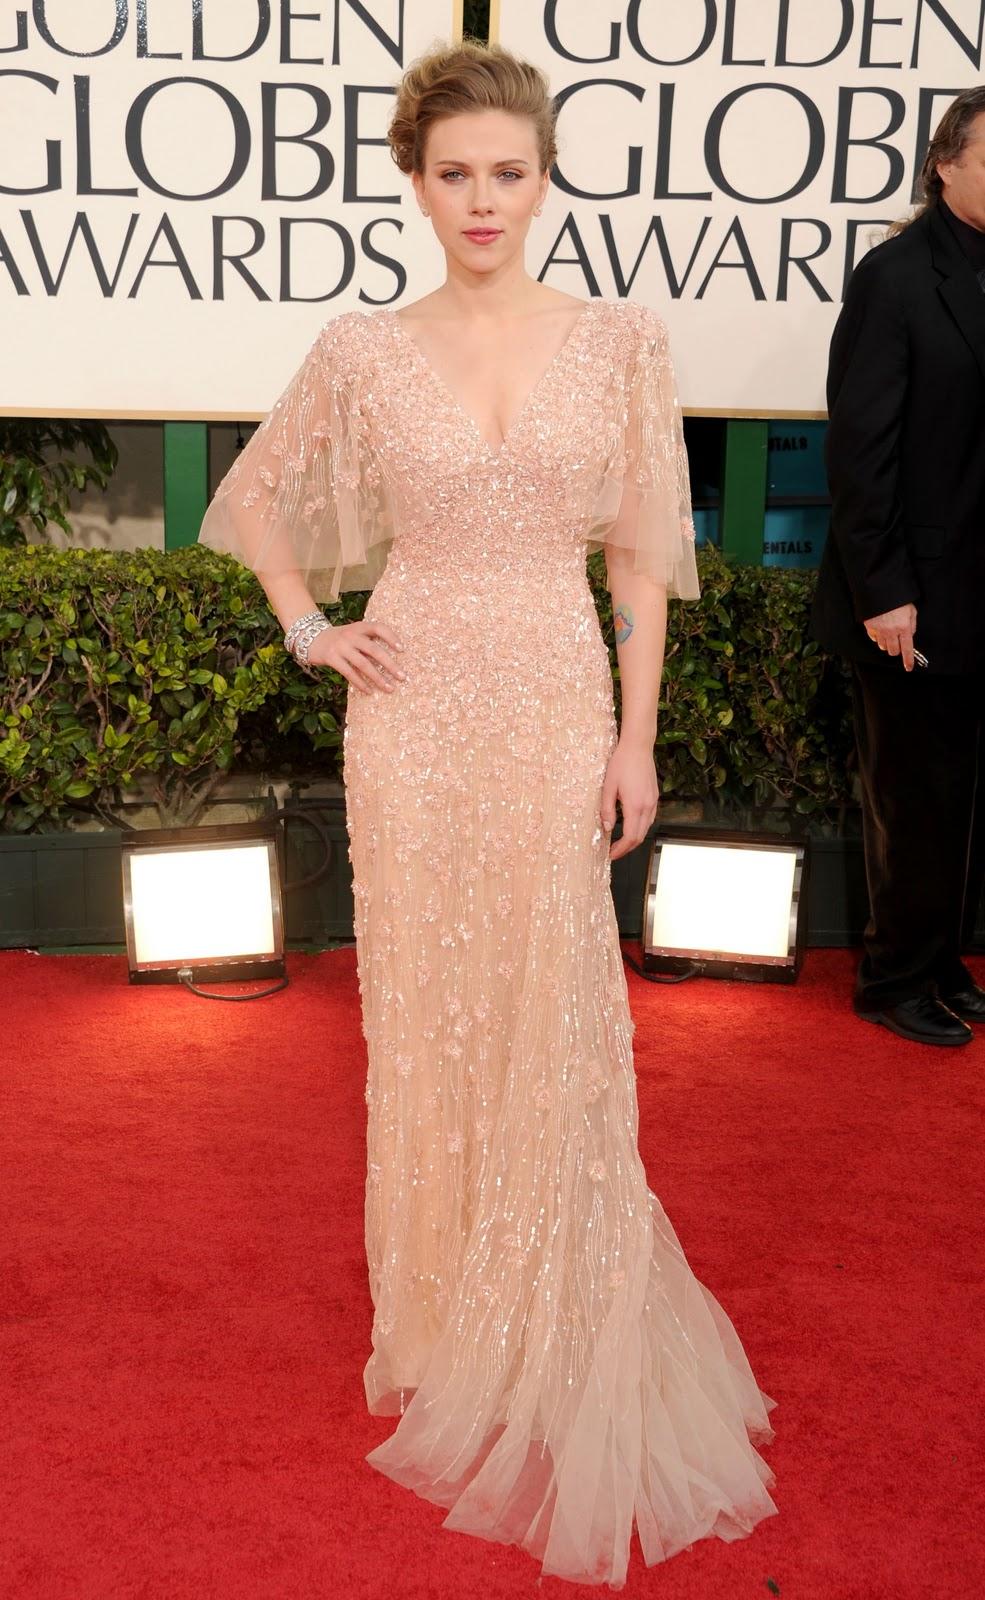 Golden Globes: Scarlett Johansson in Elie Saab - Coco's Tea Party